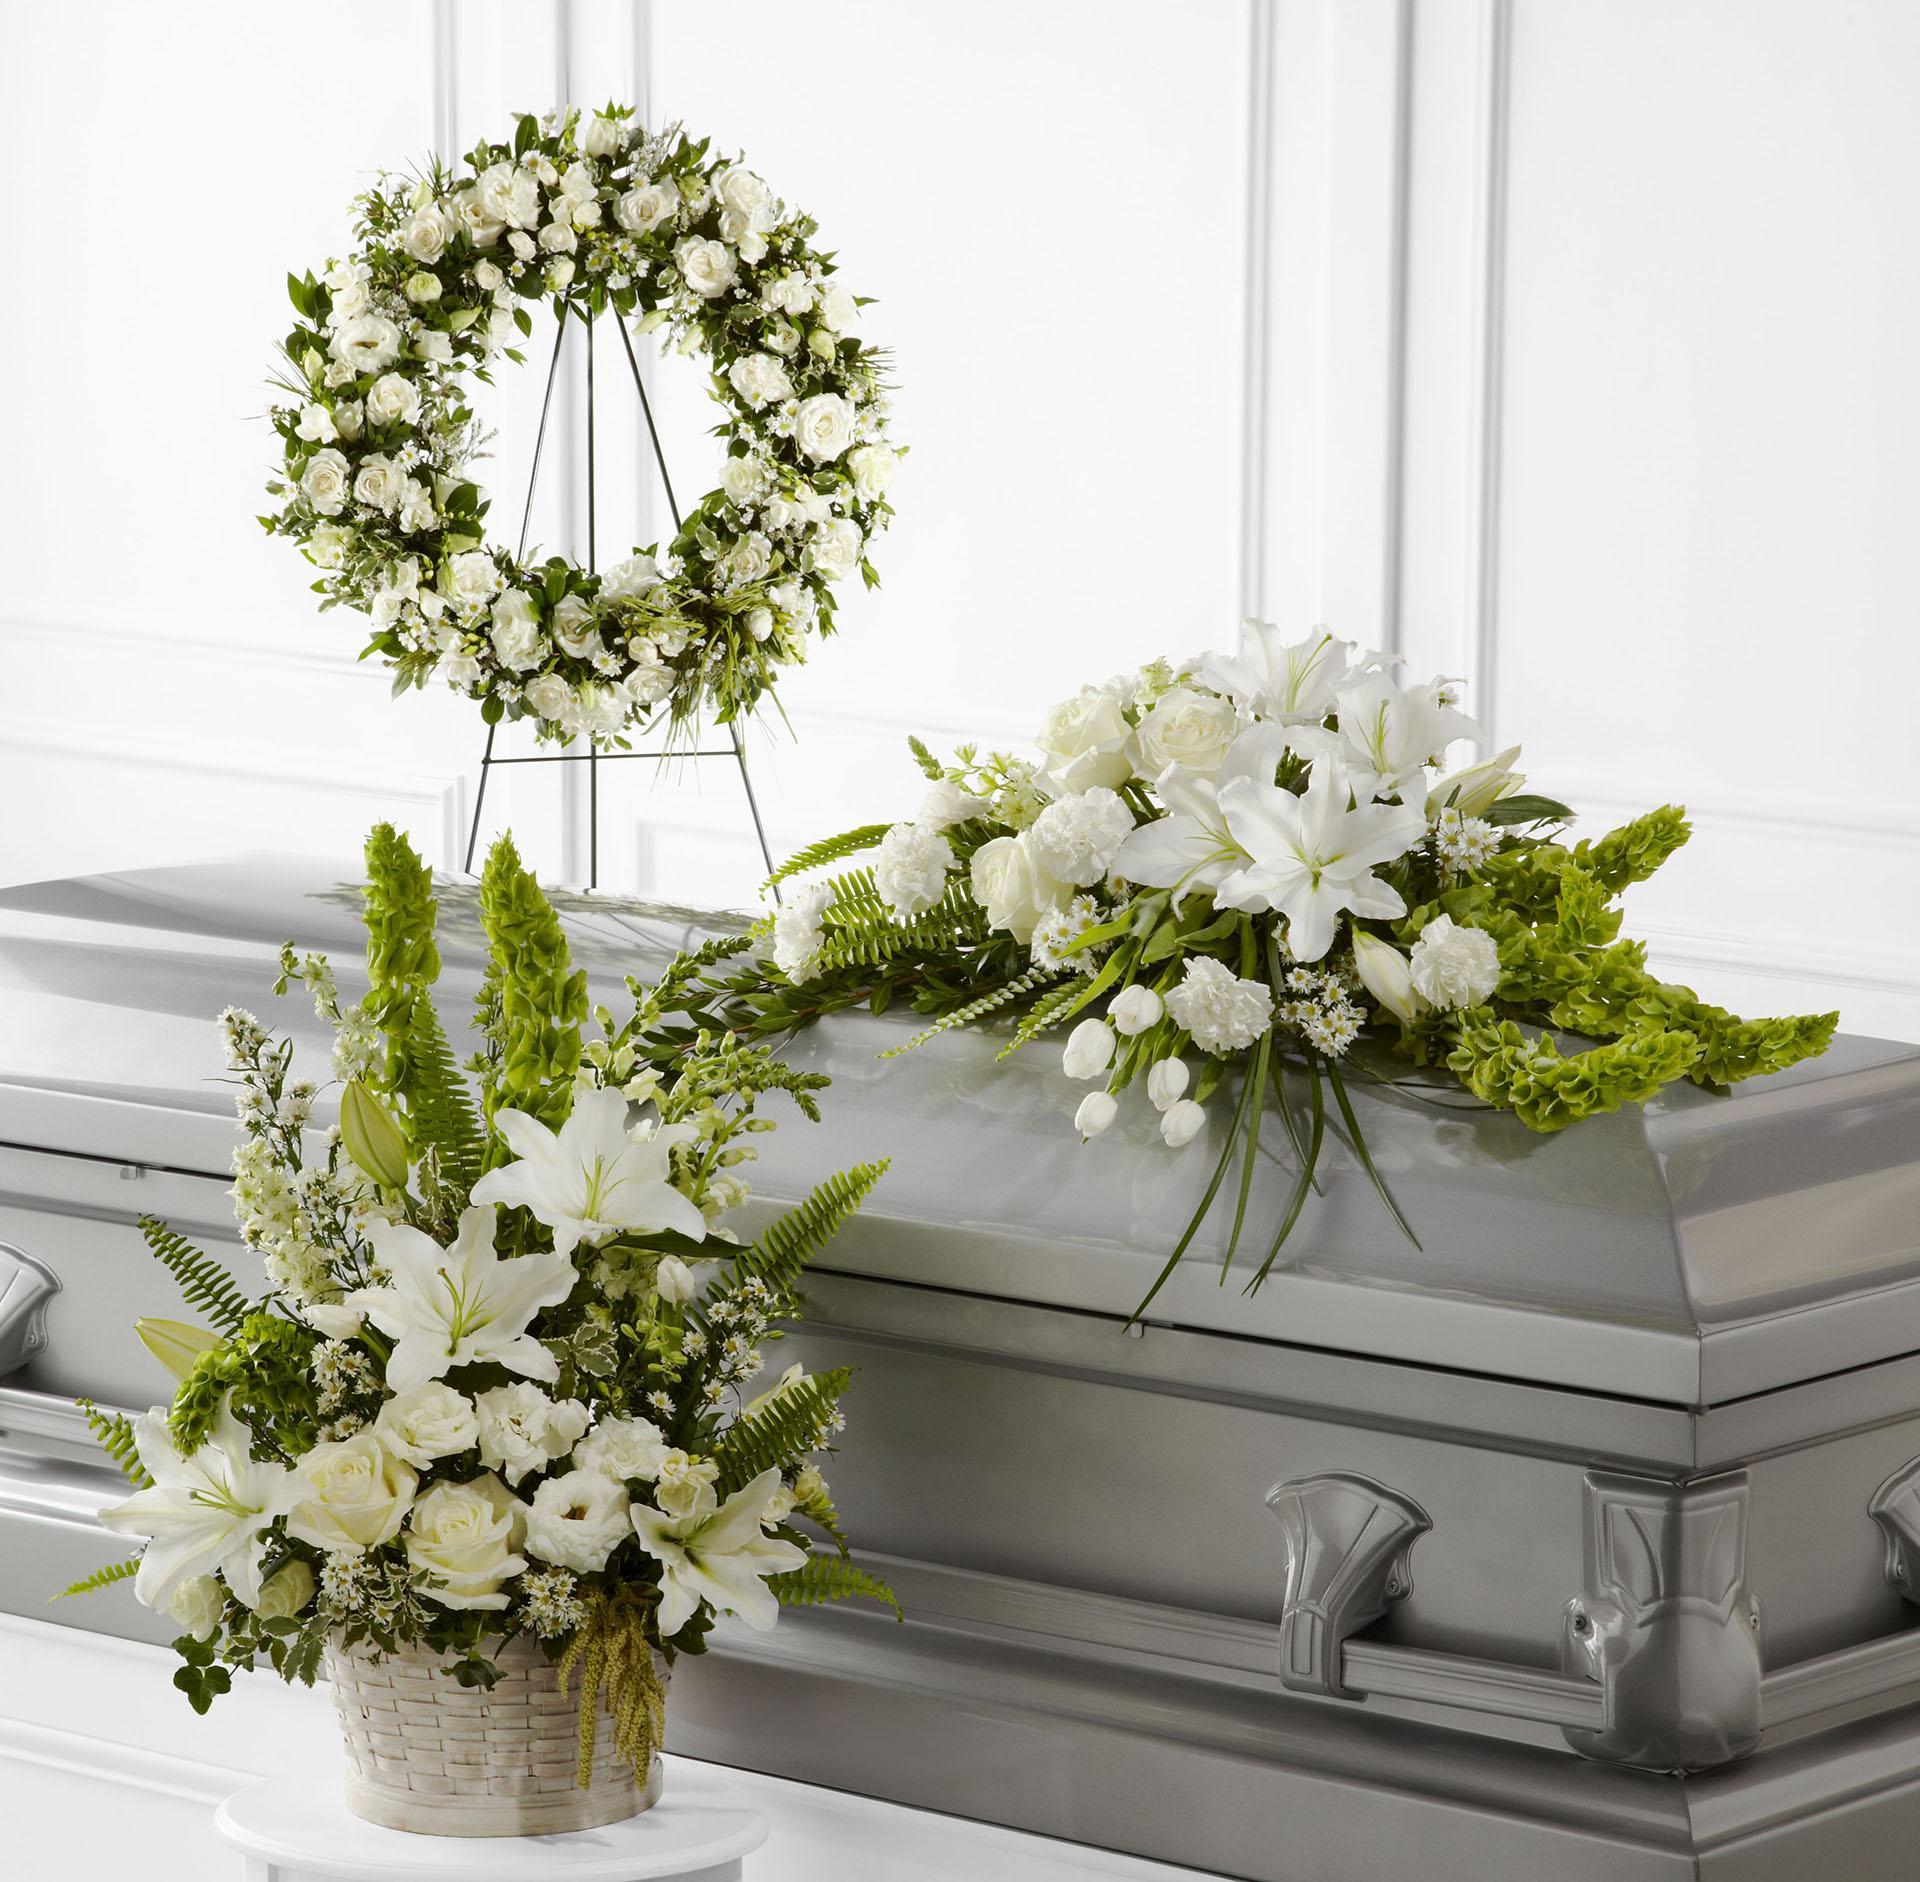 types-of-funeral-flower-arrangements